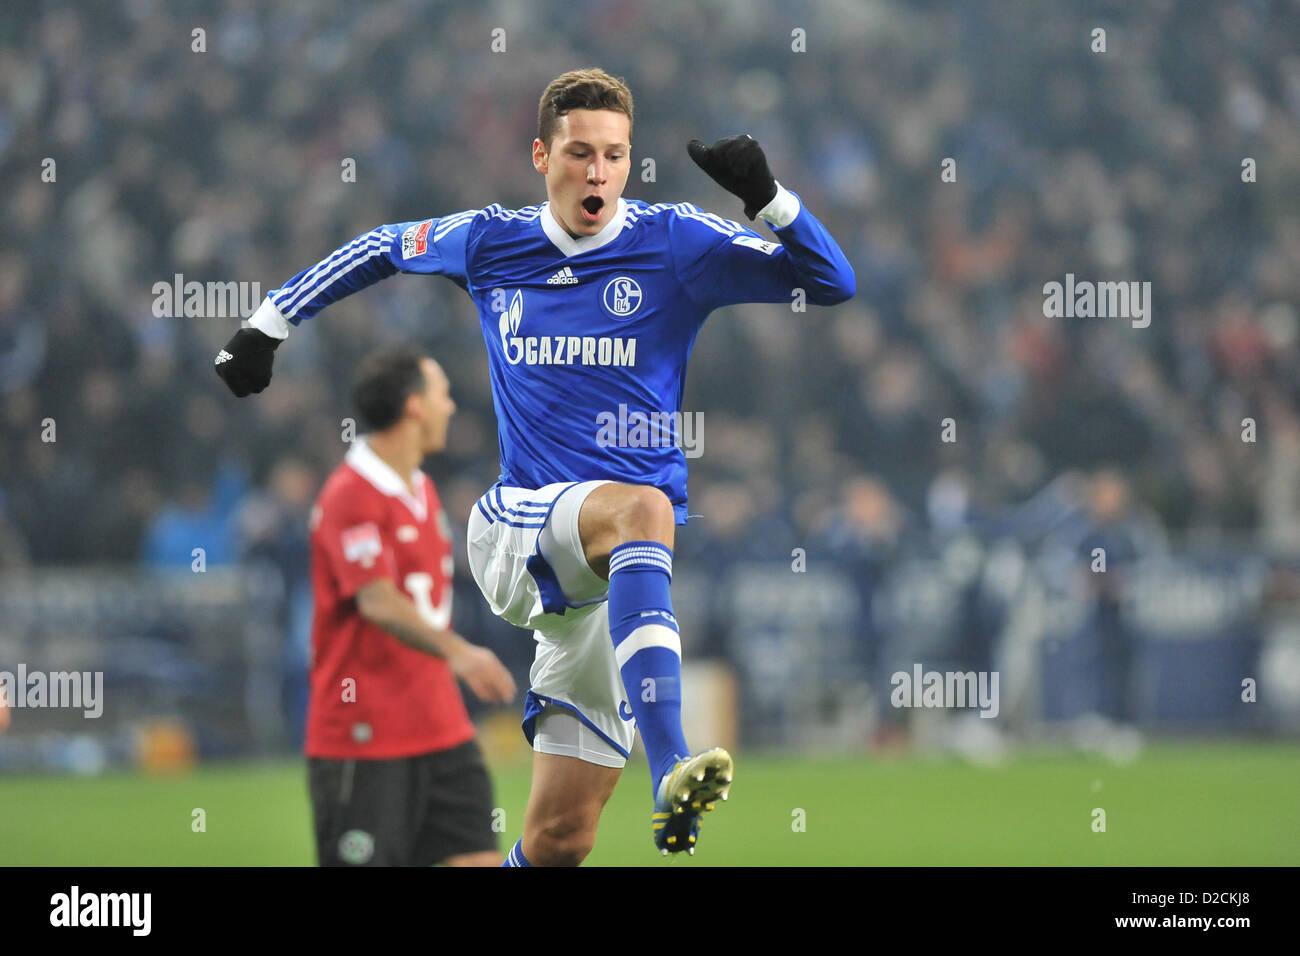 Fußball 1. Bundesliga 18. Spieltag: Schalke 04 - Hannover 96 am 18.01.2013 in der Veltins-Arena in Gelsenkirchen - Stock Image